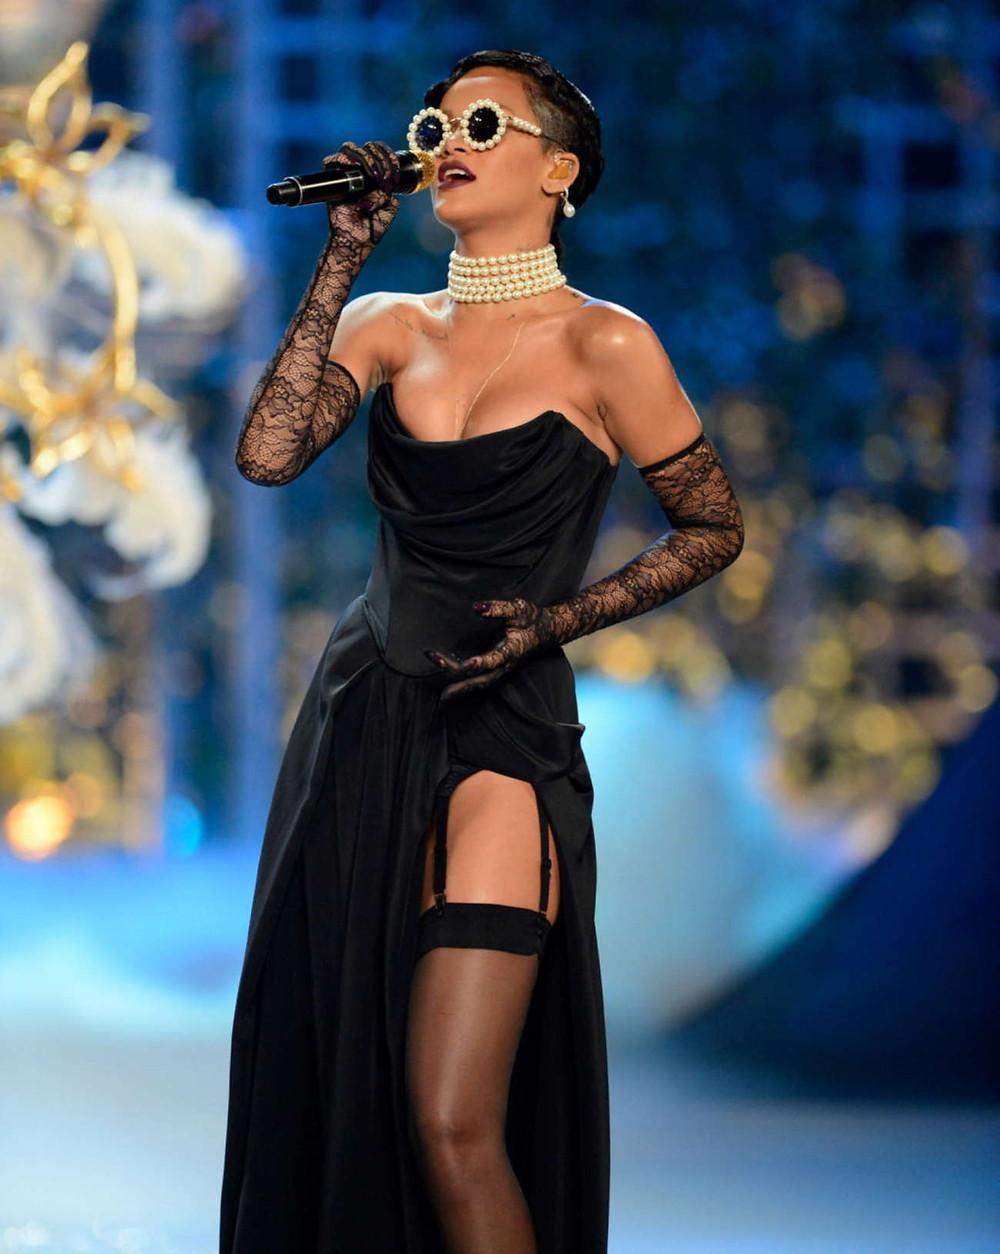 Rihanna at the 2012 Victoria's Secret fashion show runway